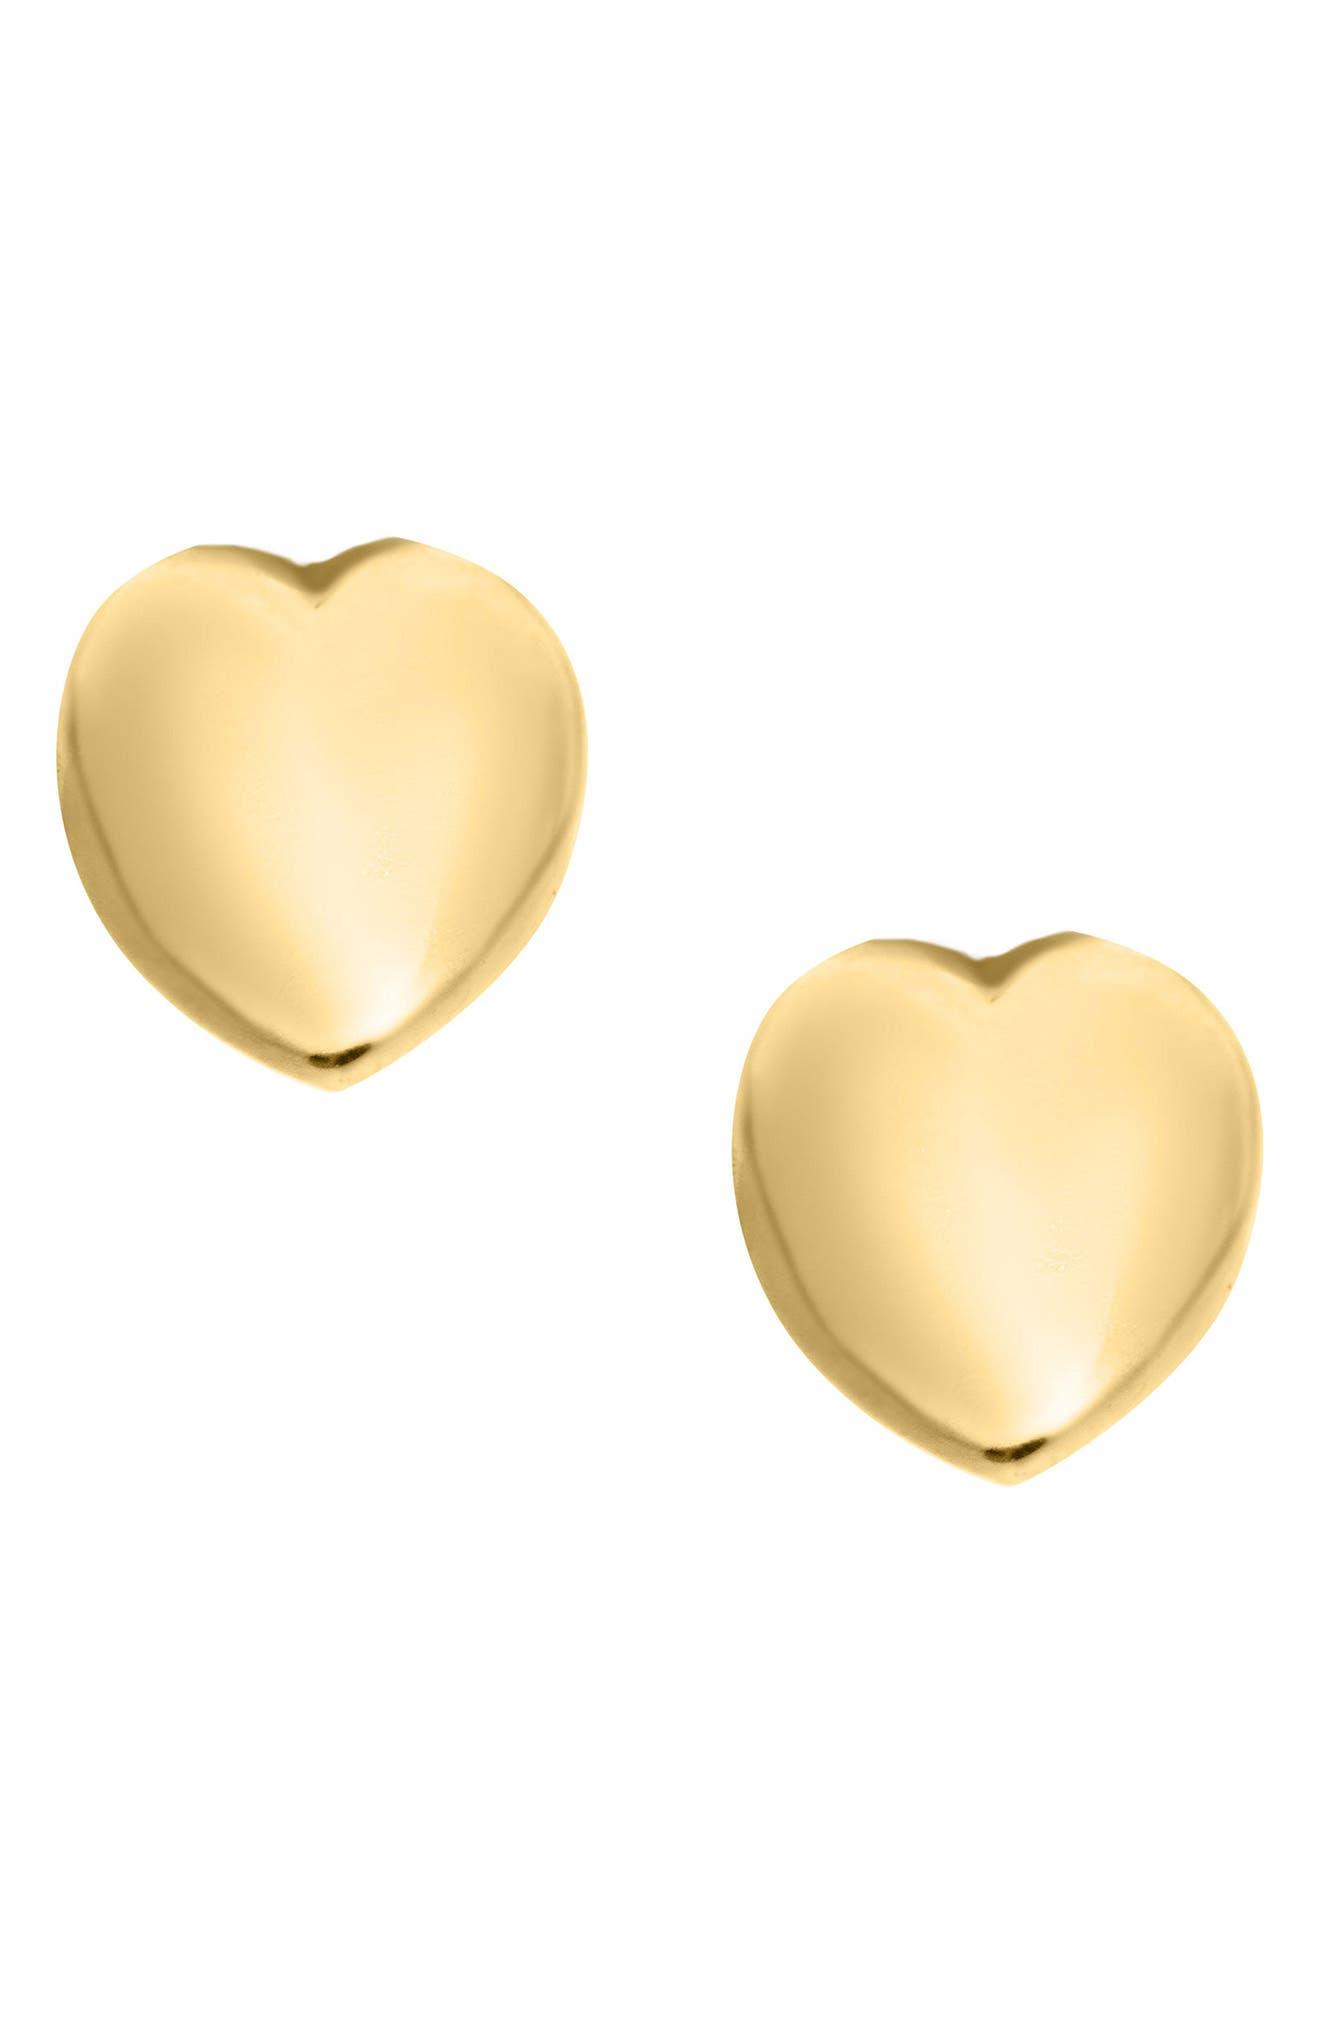 14k Gold Puffed Heart Earrings,                             Main thumbnail 1, color,                             GOLD